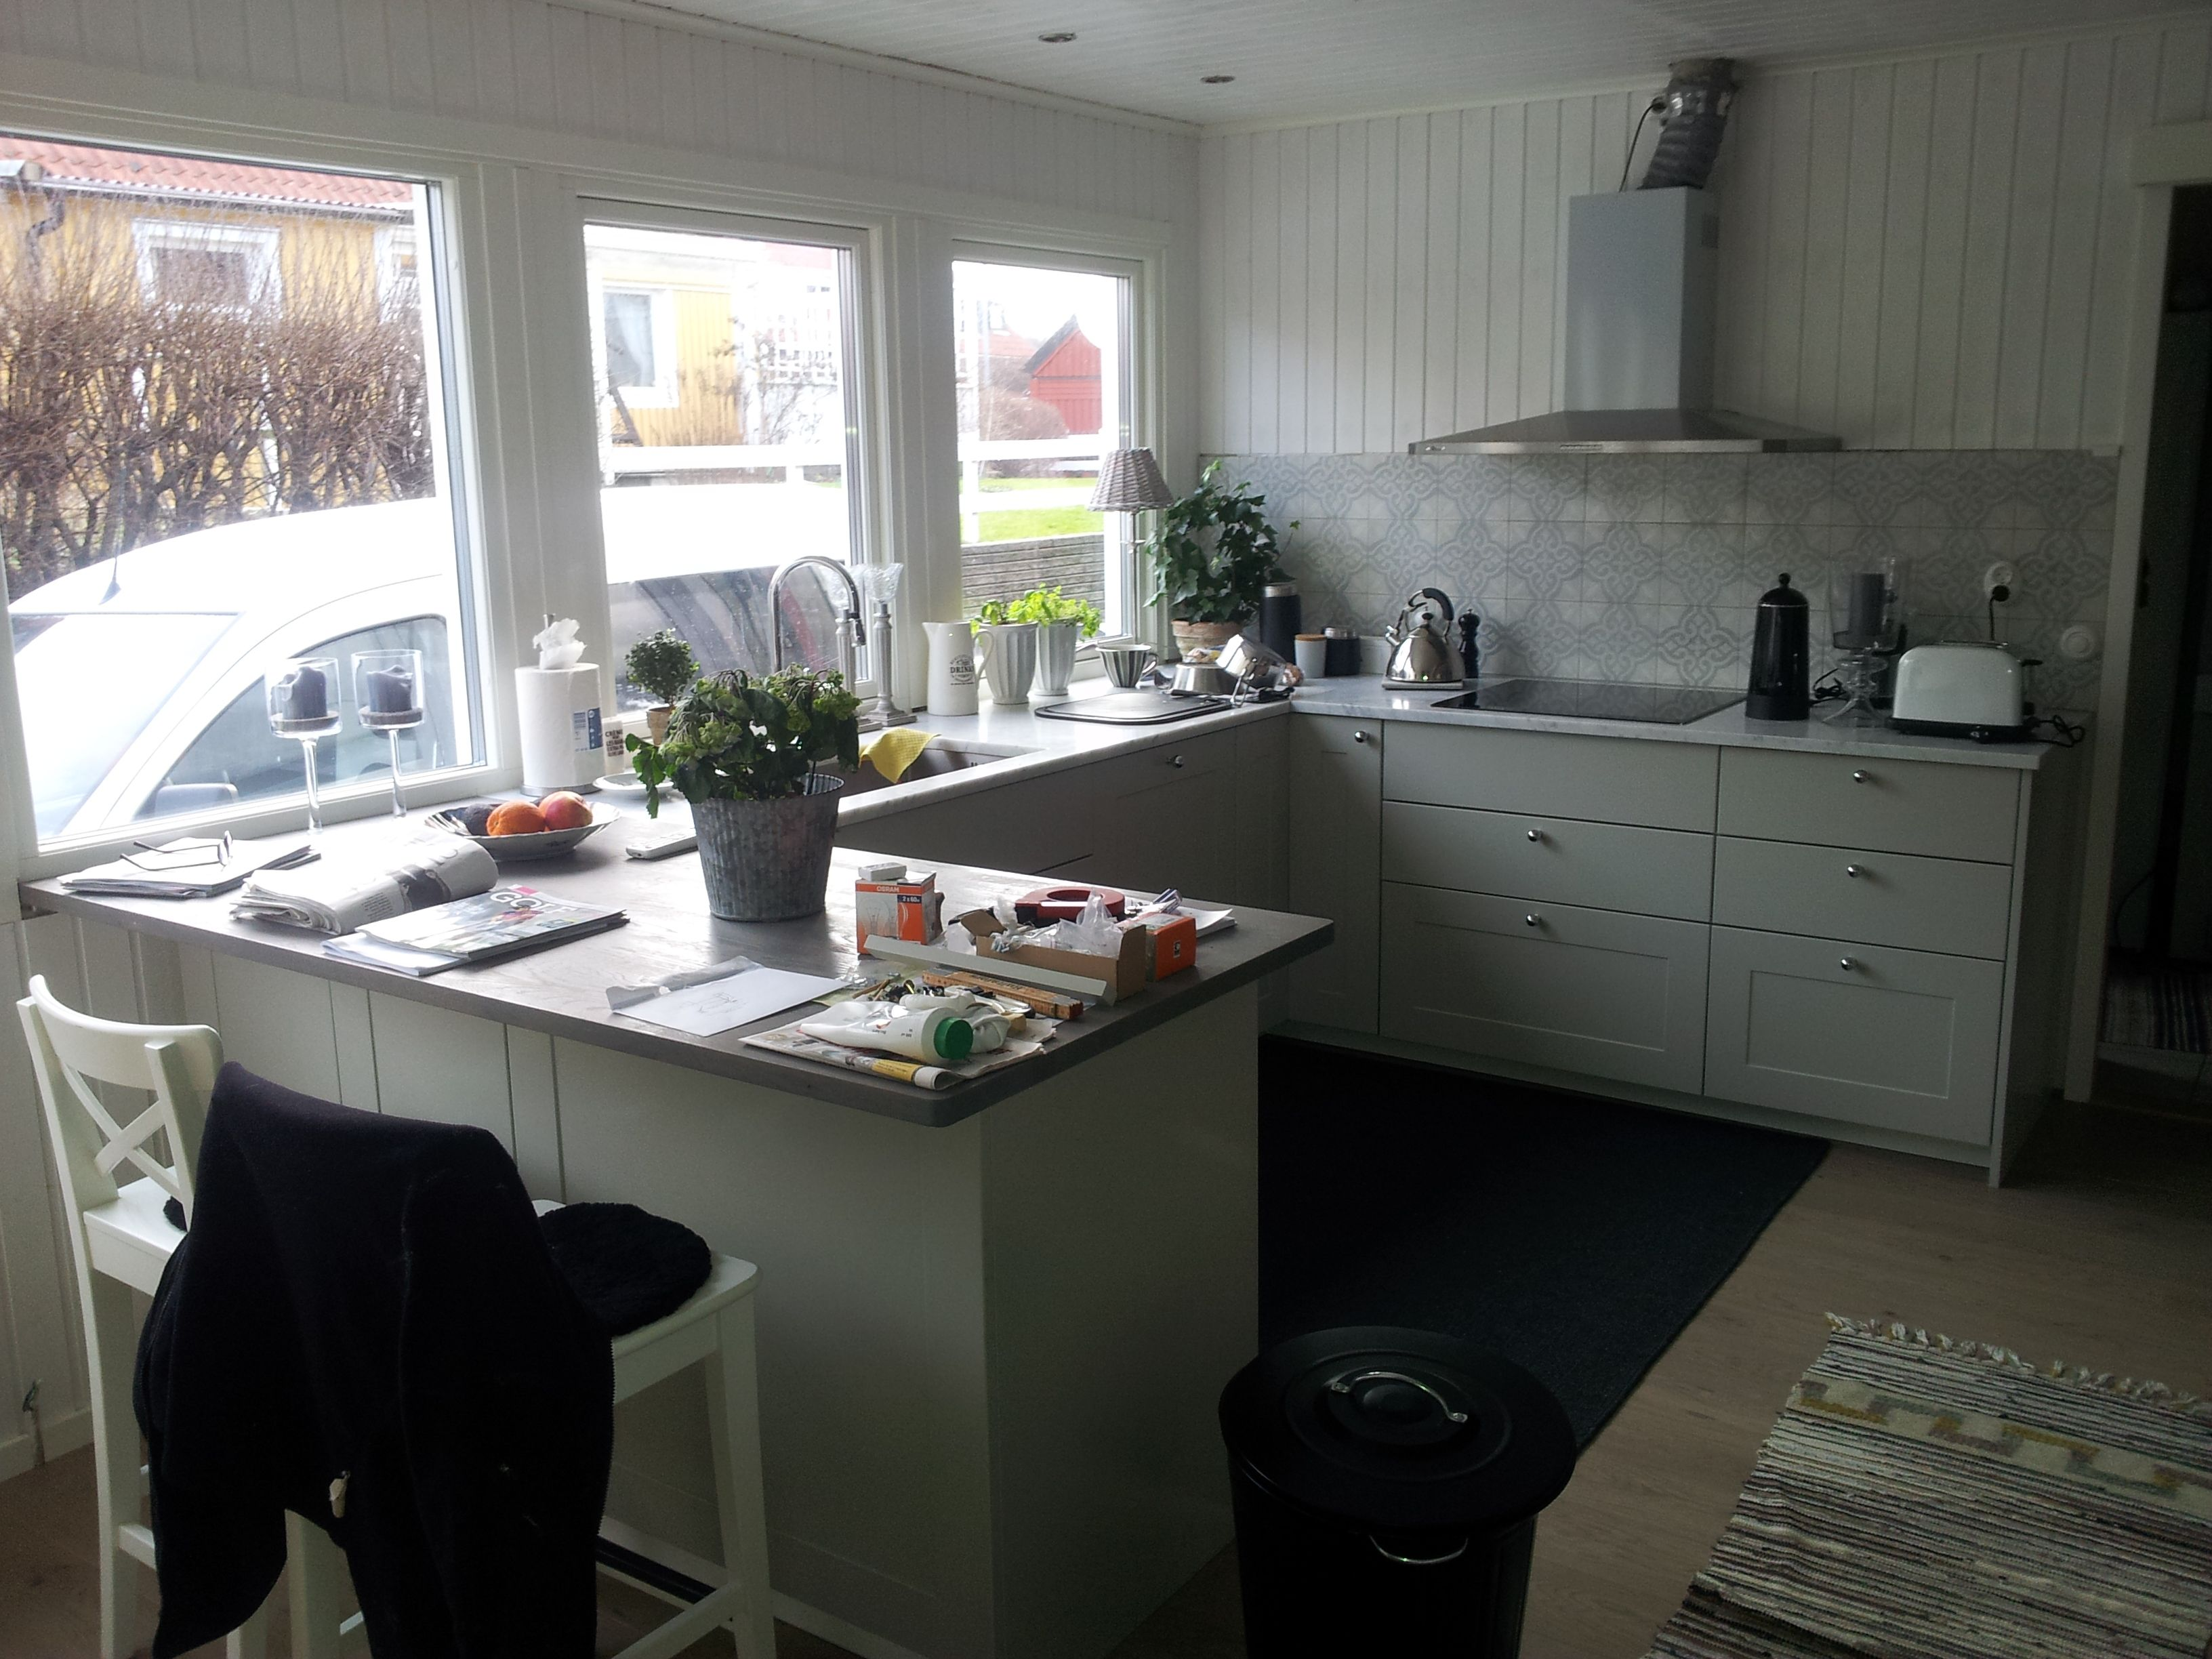 "Referensjobb ""Helrenovering av kök"" utfört av LGK Bygg & Entreprenad"